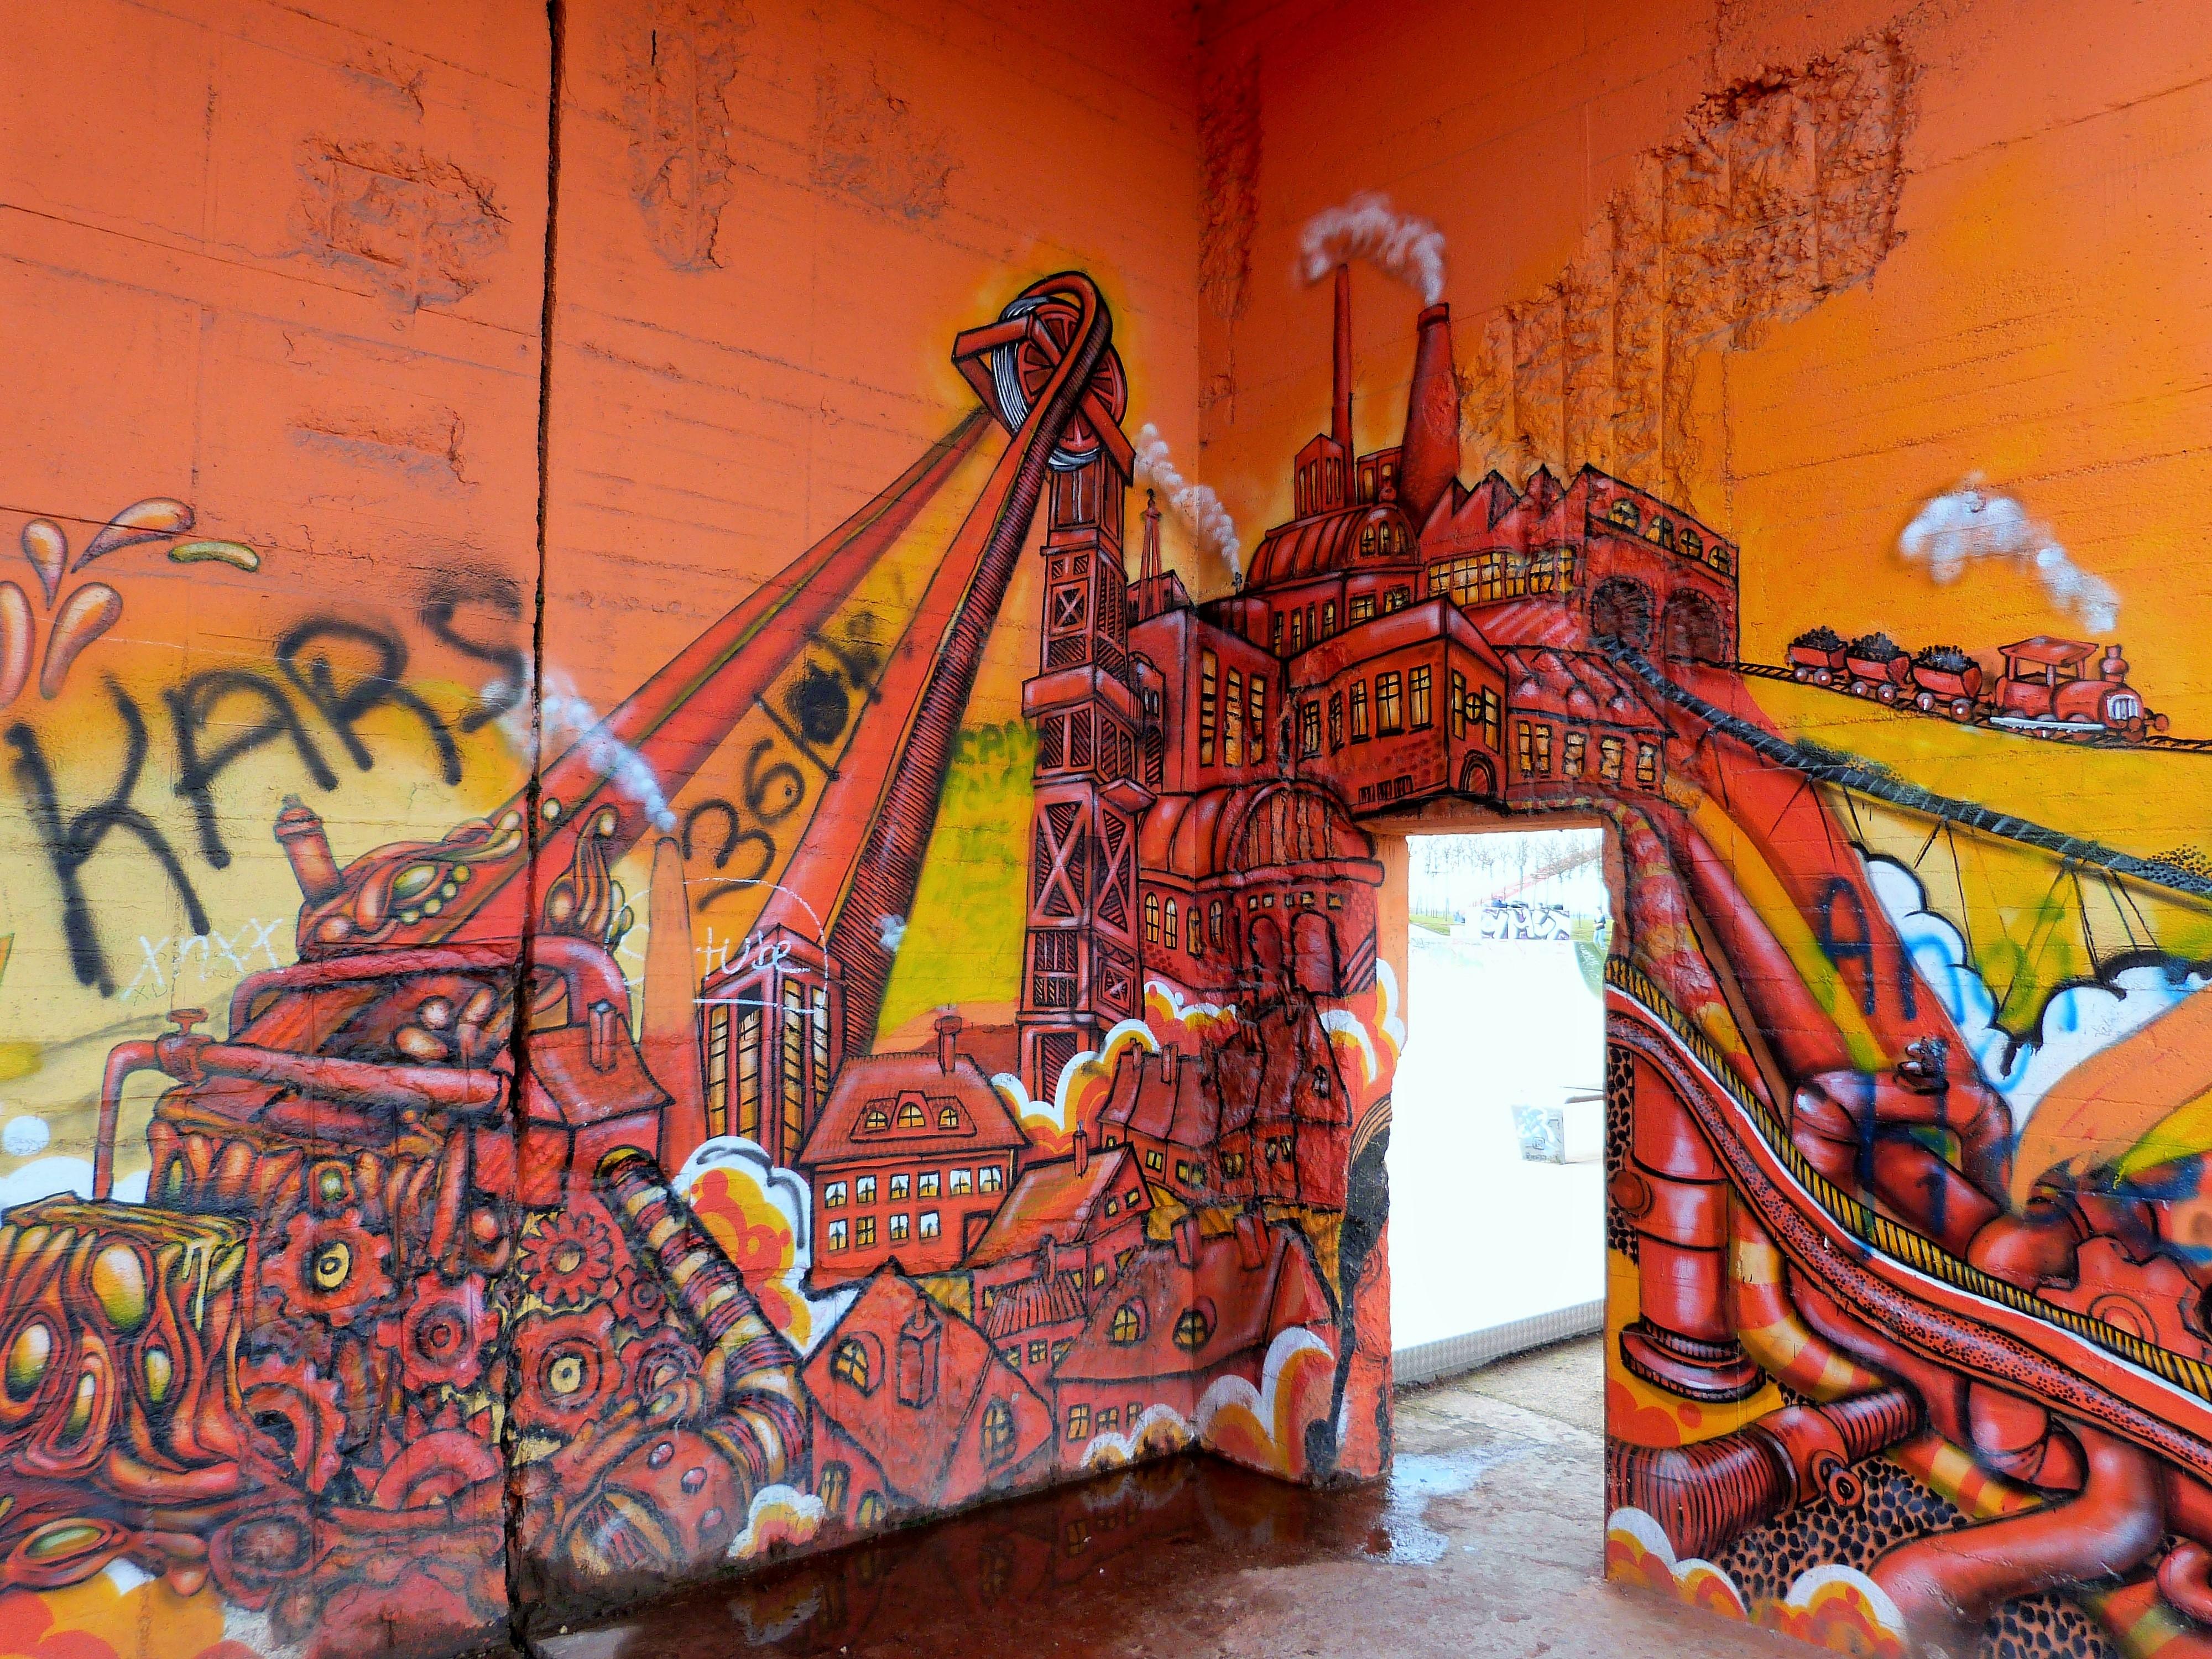 Graffiti Duisburg rheinpark graffiti duisburg 4 continental breakfast travel